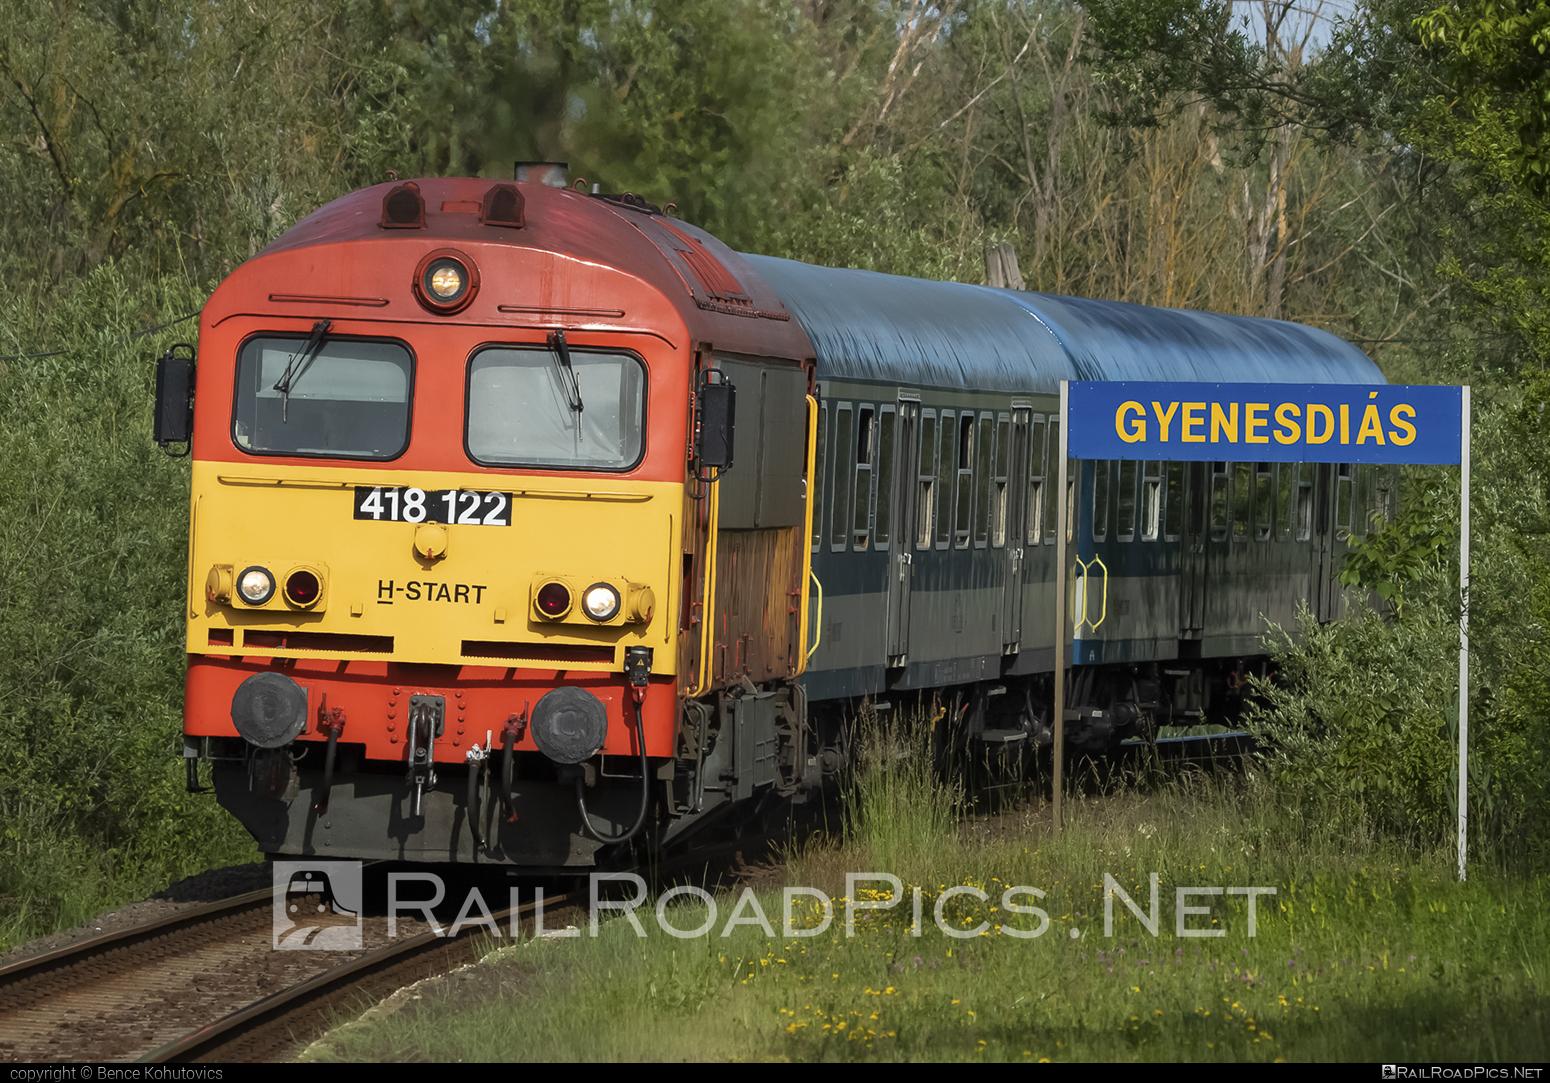 Ganz-MÁVAG DHM7-3 - 418 122 operated by MÁV-START ZRt. #dhm7 #dhm73 #ganzm41 #ganzmavag #ganzmavag418 #ganzmavagdhm7 #ganzmavagdhm73 #ganzmavagm41 #m41locomotive #mavstart #mavstartzrt